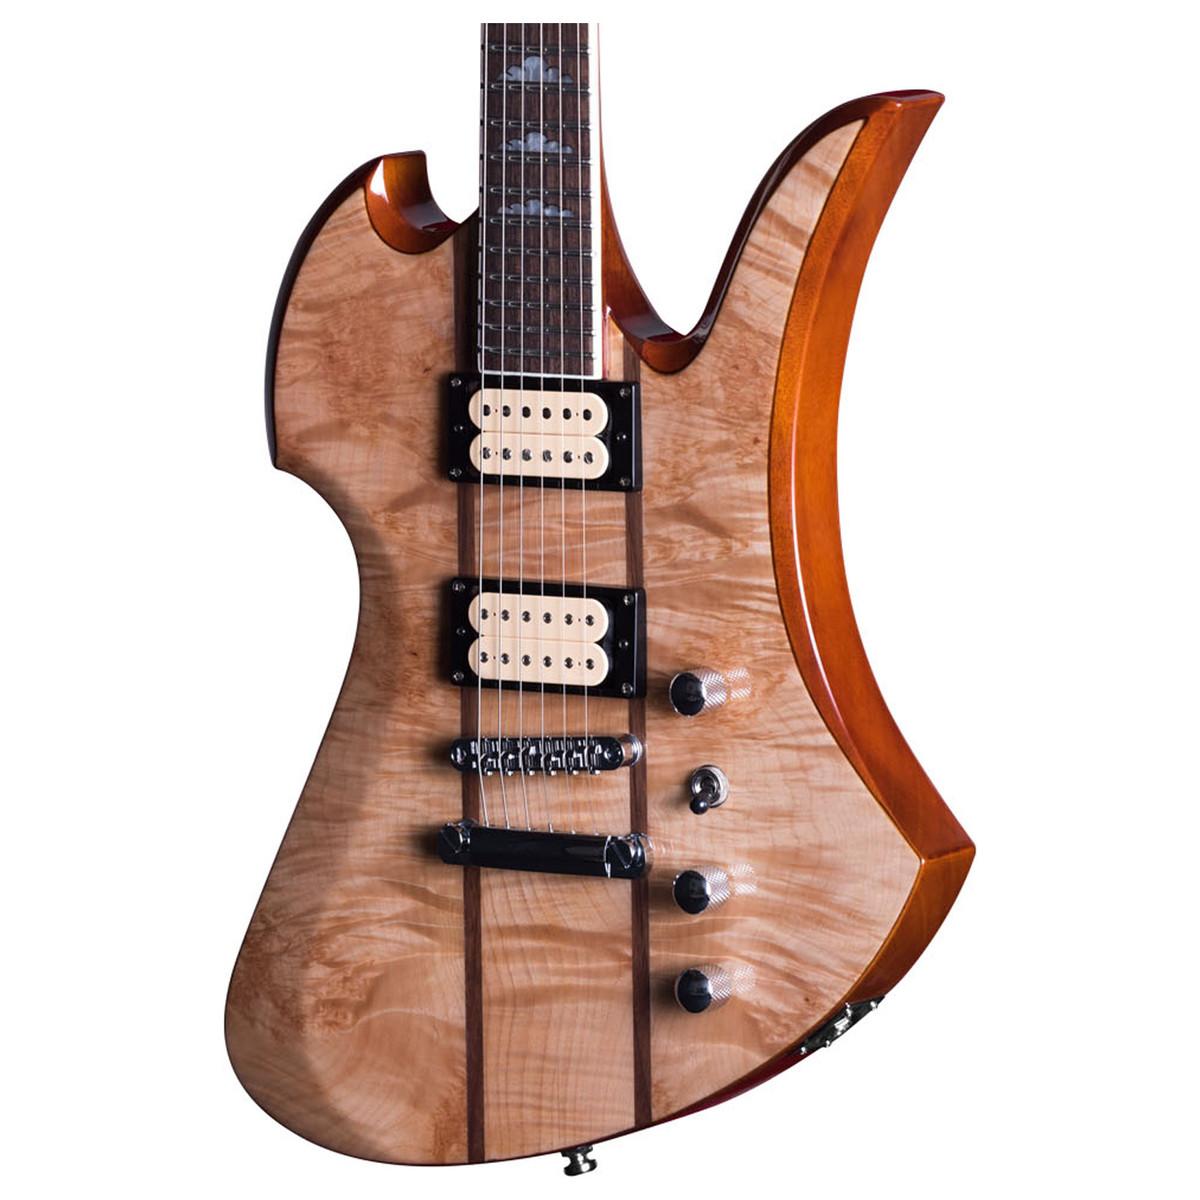 bc rich mockingbird mk9 guitar with hard case natural maple burl at. Black Bedroom Furniture Sets. Home Design Ideas